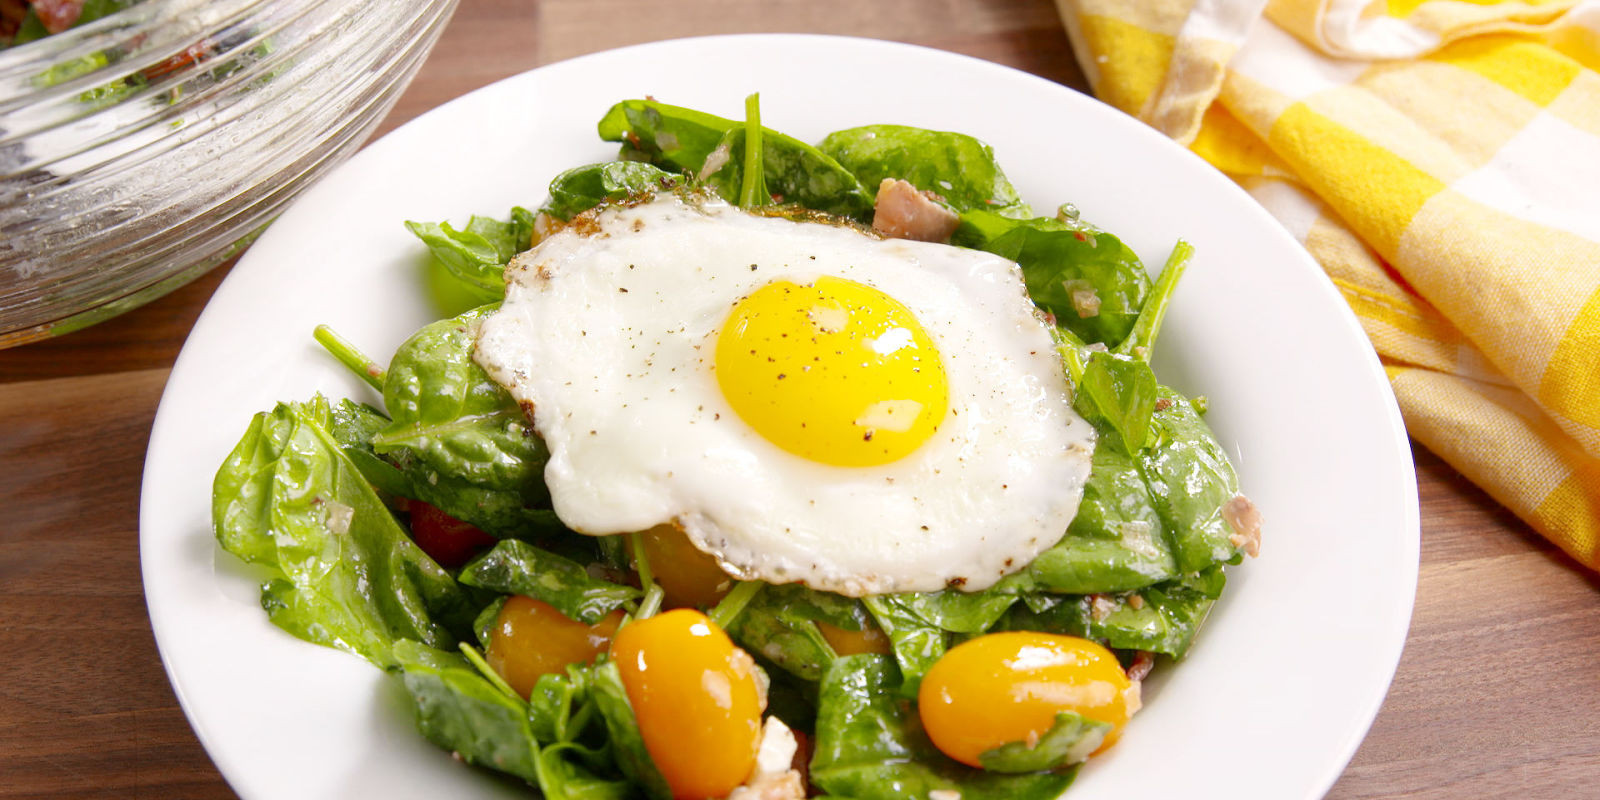 Eggs For Breakfast Healthy  16 Healthy Egg Recipes Healthy Ways To Make Eggs—Delish